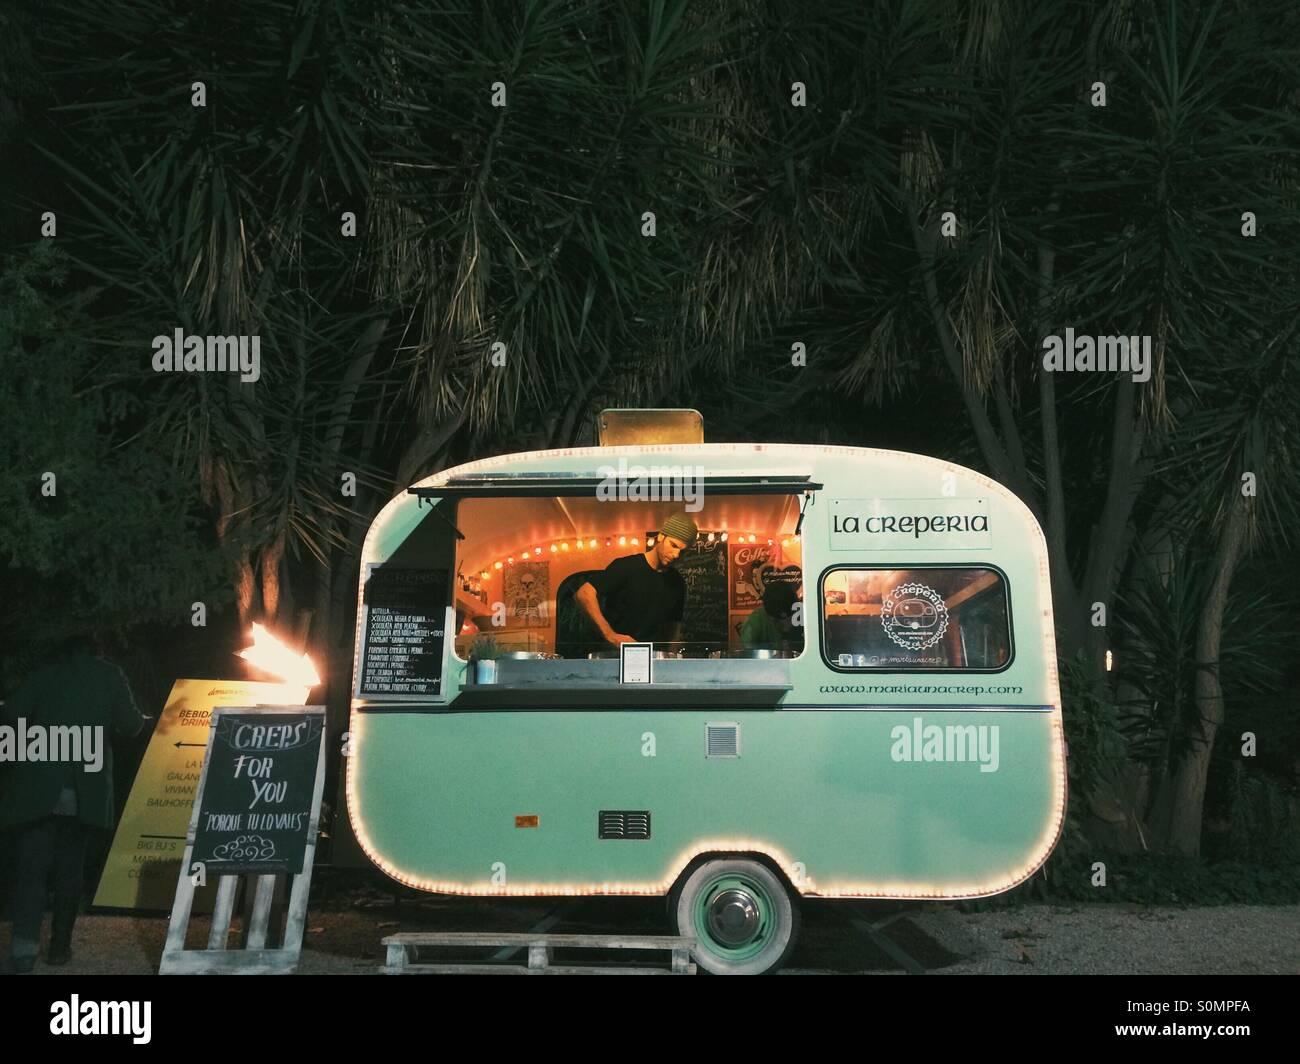 Green Food Truck - Stock Image